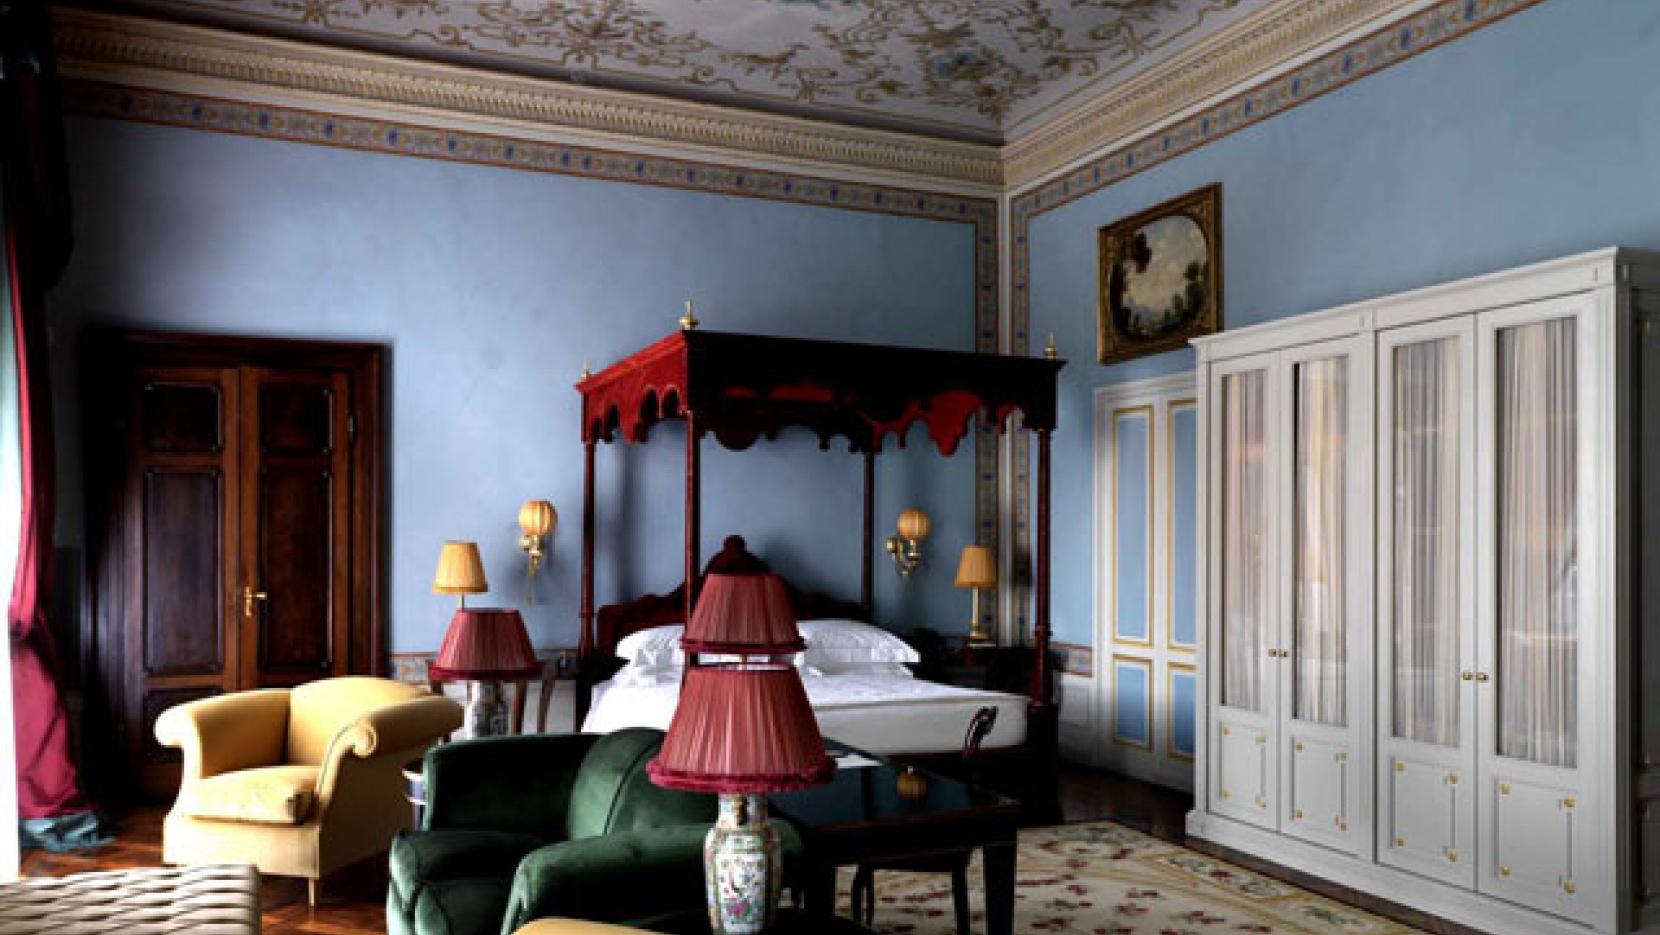 Grand Hotel Villa Cora In Florence Italy Yatzer